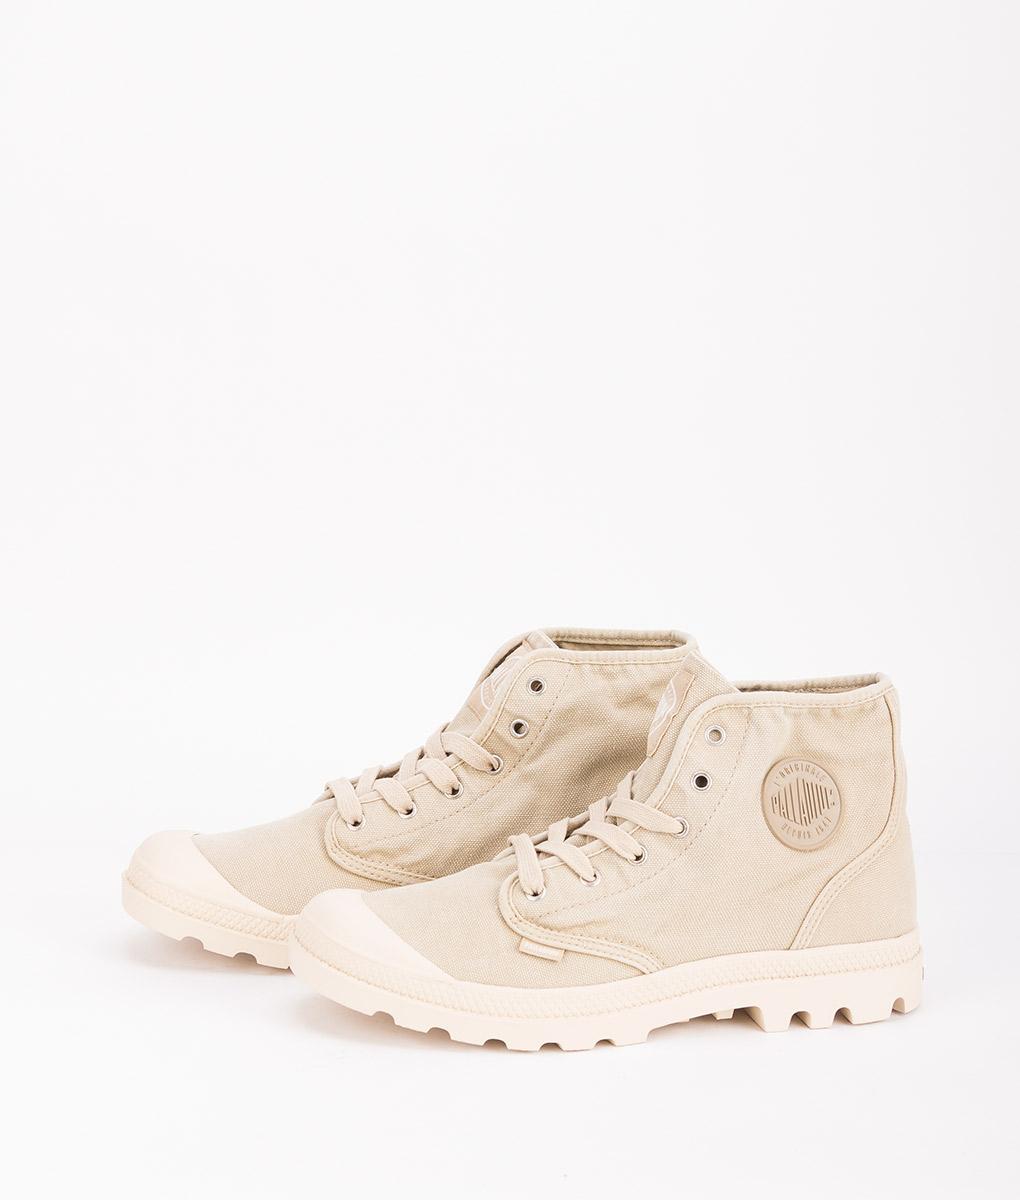 PALLADIUM Men Sneakers 2352 PAMPA HI, Sahara Ecru 74.99